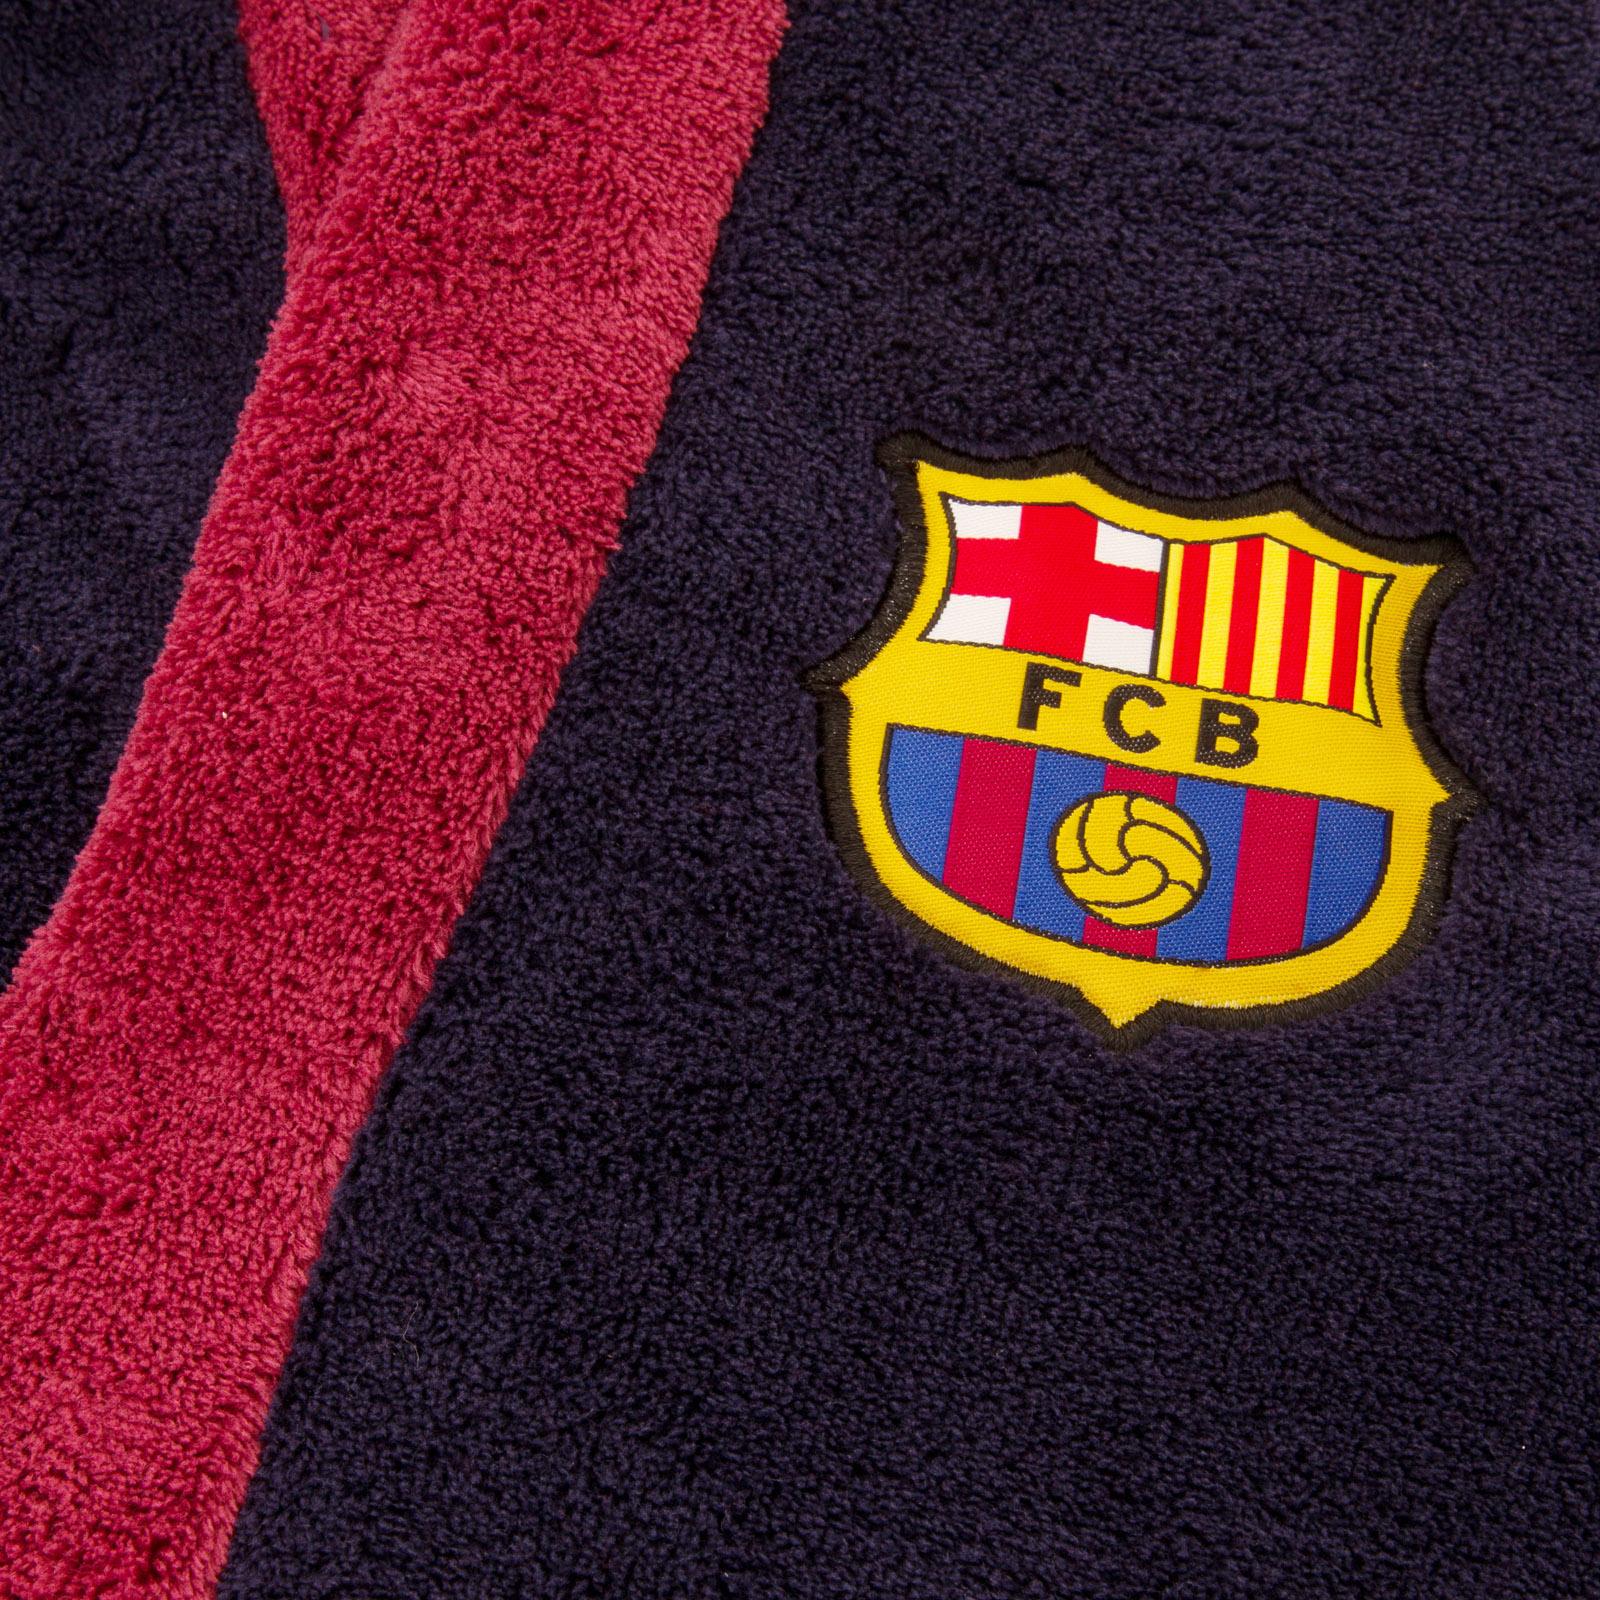 FC-Barcelona-Official-Football-Gift-Boys-Hooded-Fleece-Dressing-Gown-Robe miniatuur 7